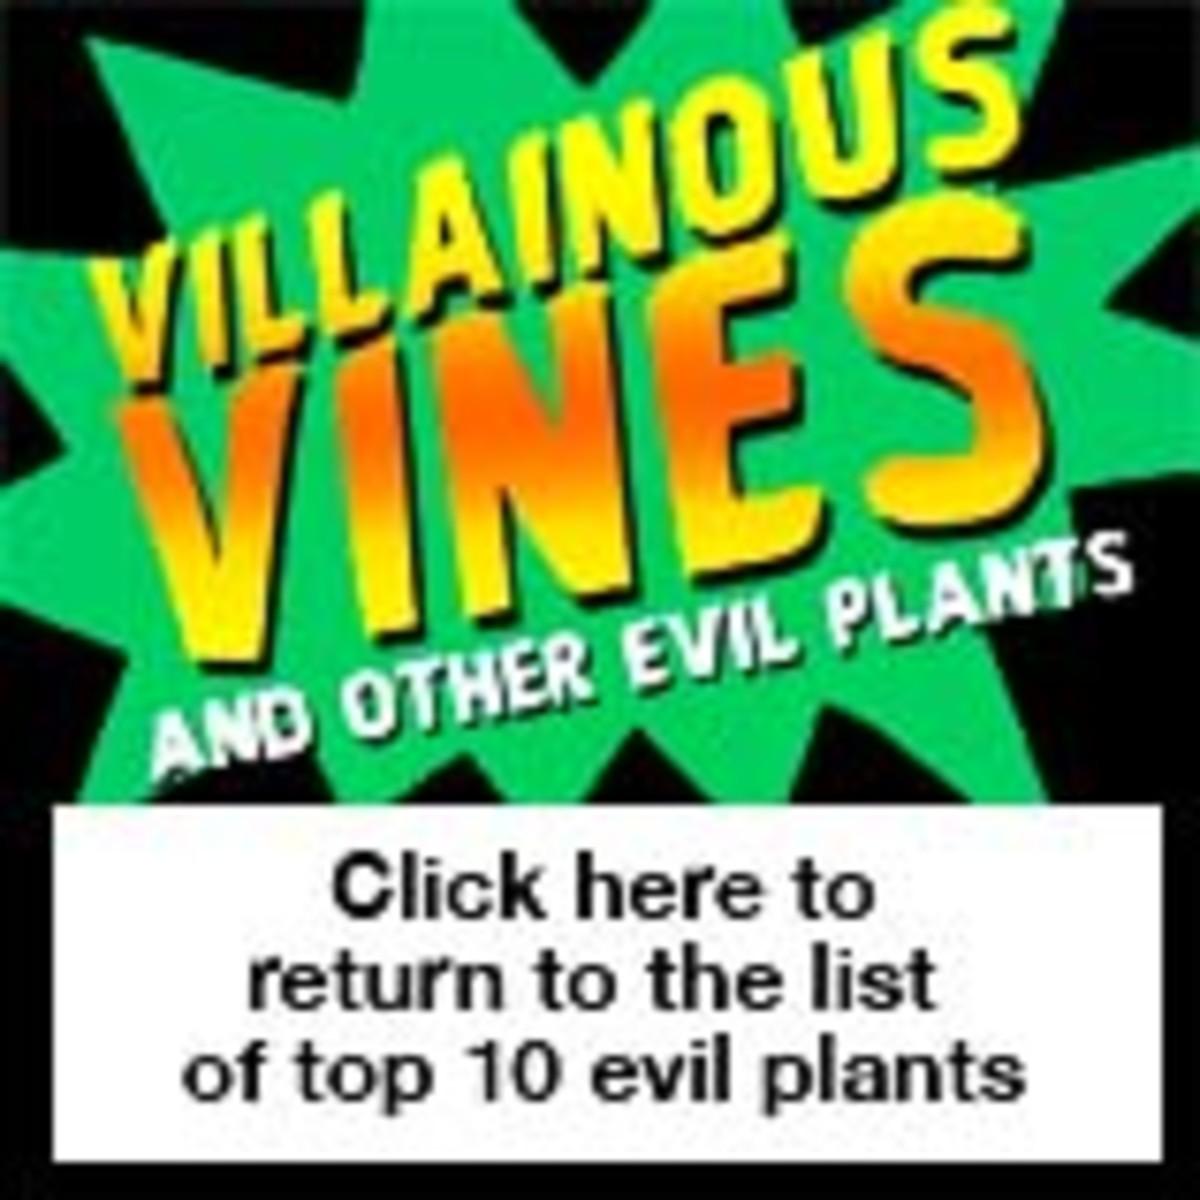 VILLAIN_PLANT_BUG